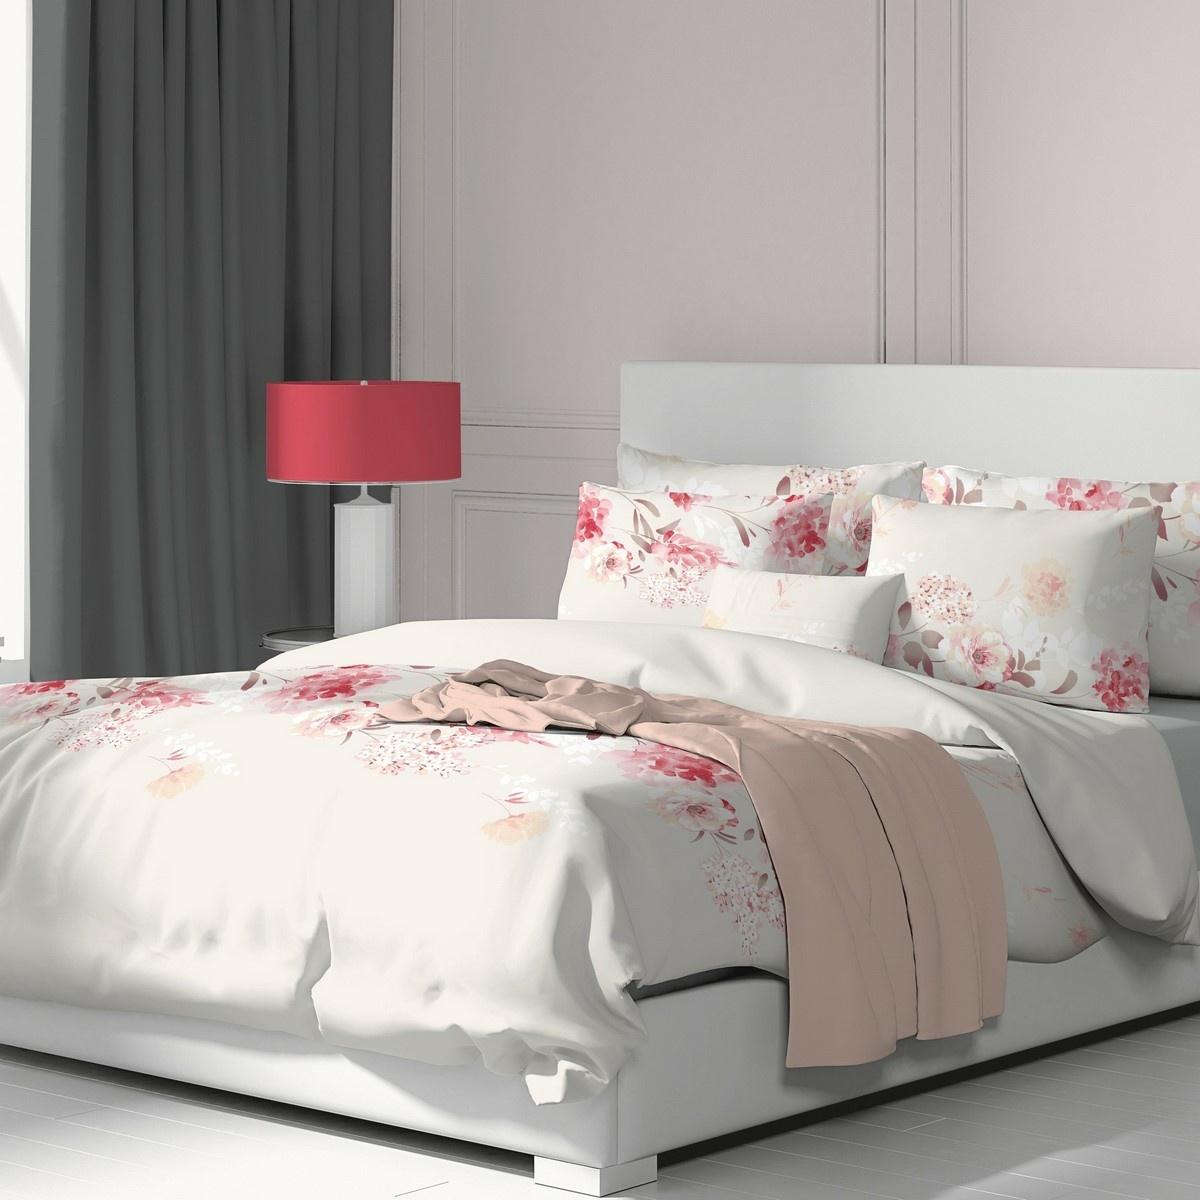 Kvalitex Bavlněné povlečení Tanea růžová, 220 x 200 cm, 2 ks 70 x 90 cm